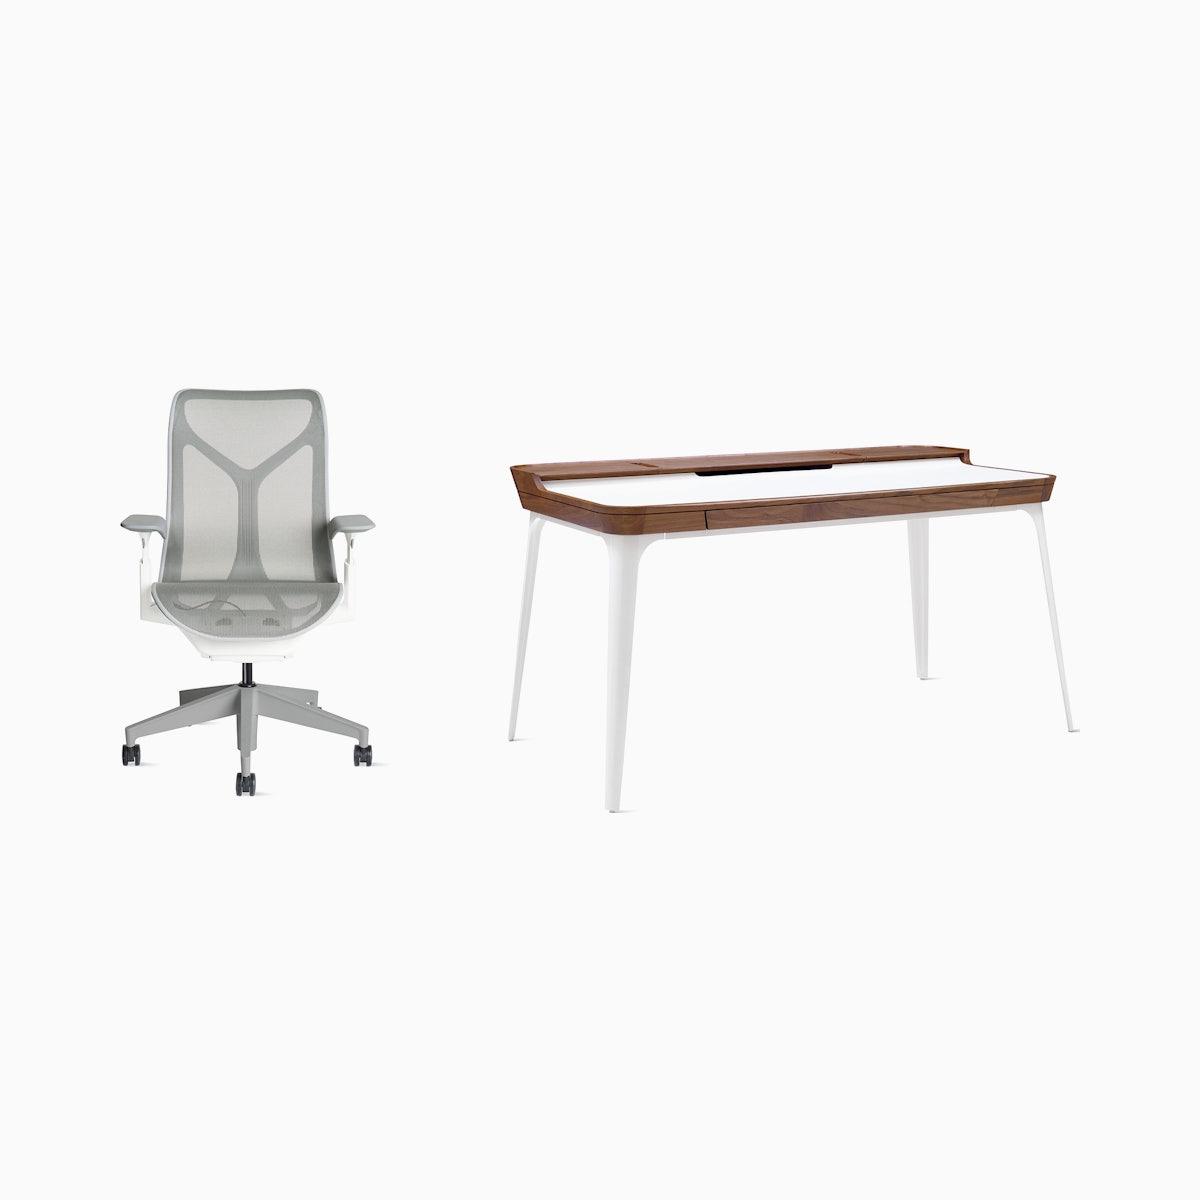 Cosm Chair / Airia Desk Office Bundle